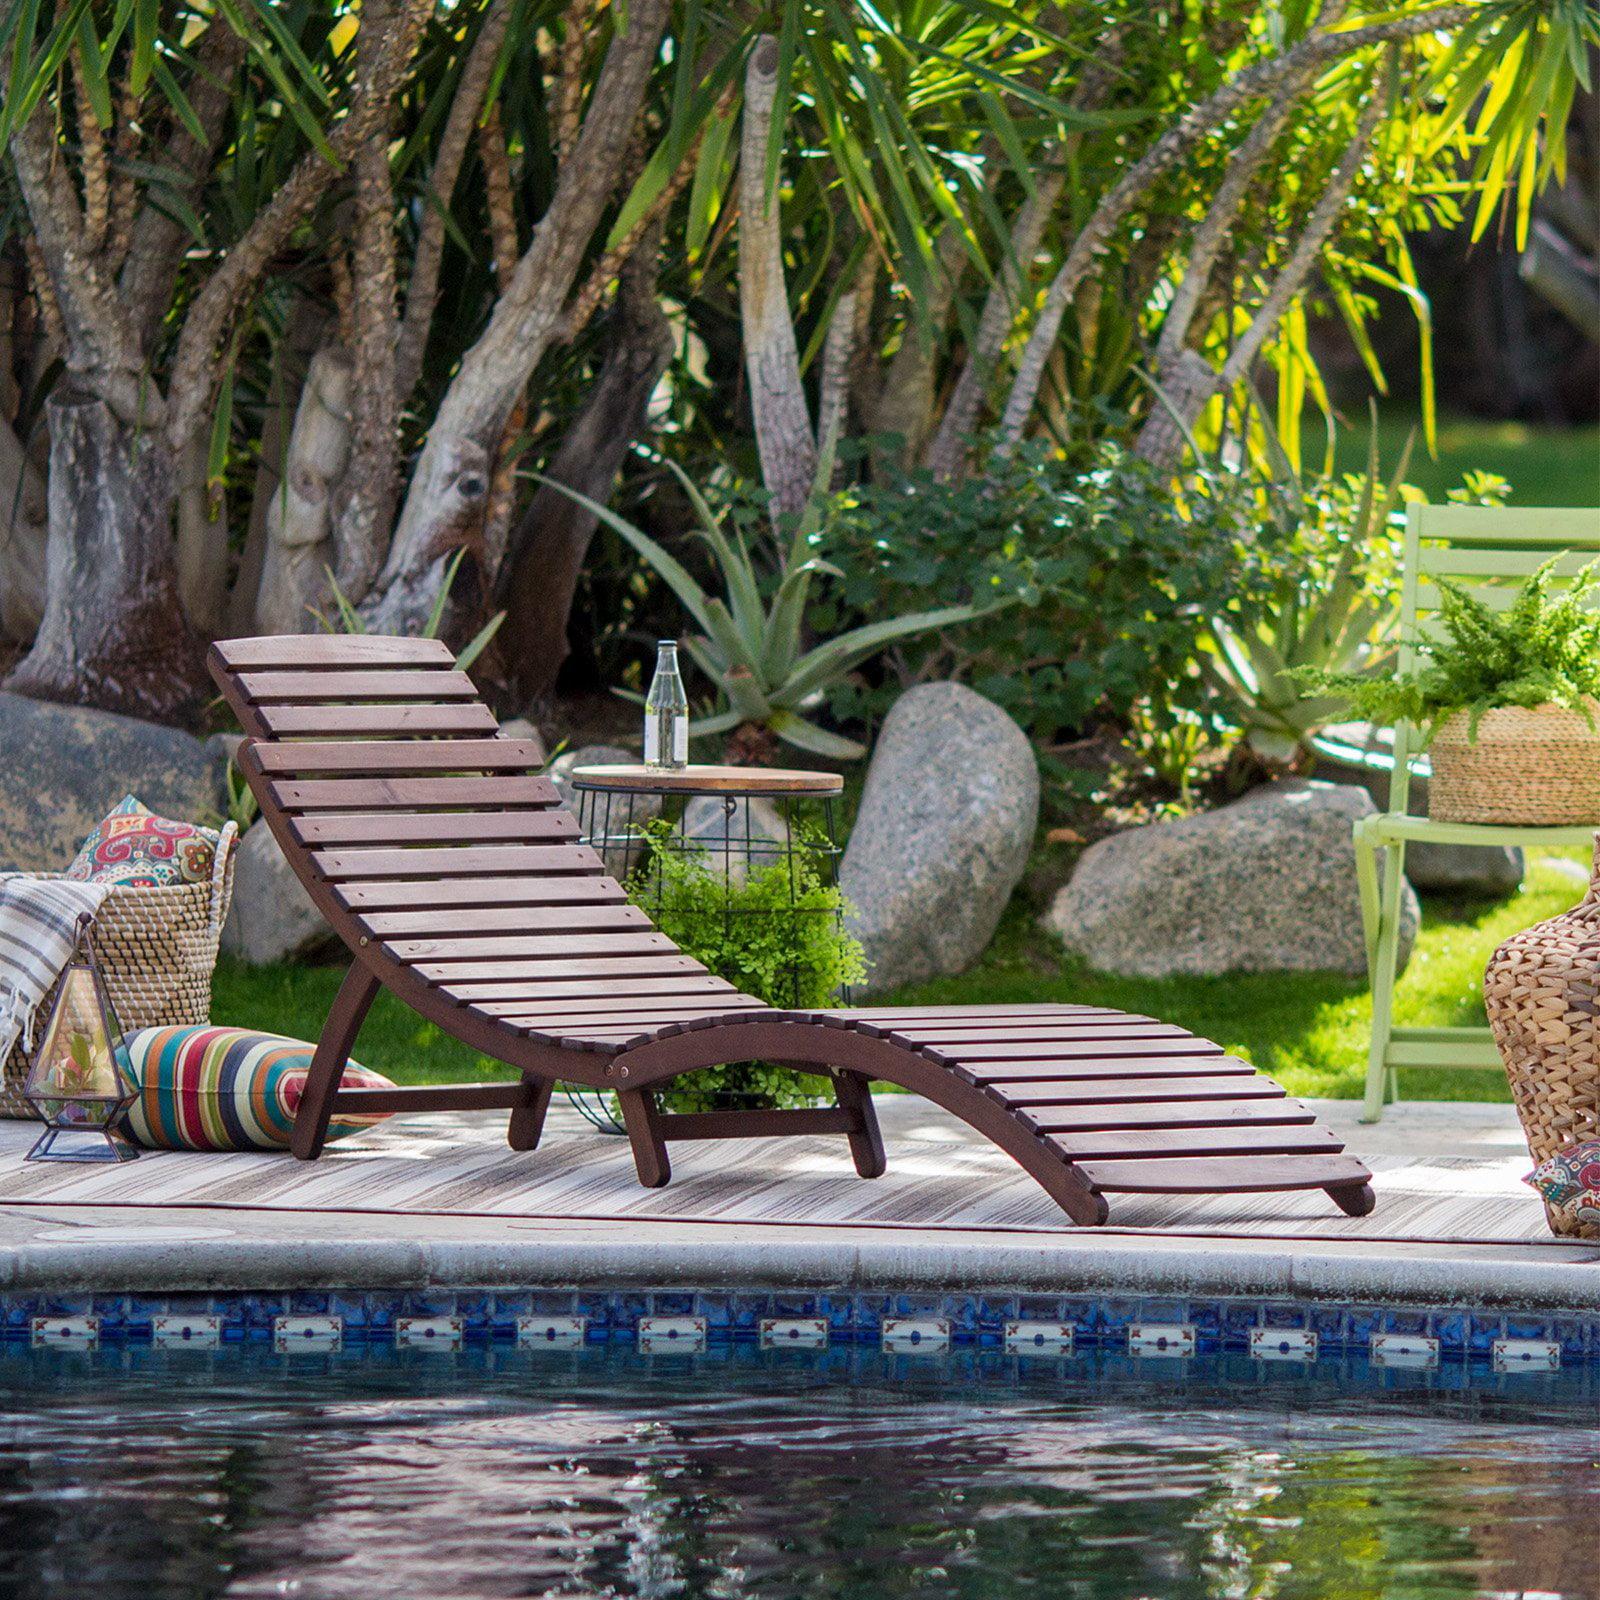 Coral Coast Rema Wave Wood Patio Chaise Lounge - Dark Brown